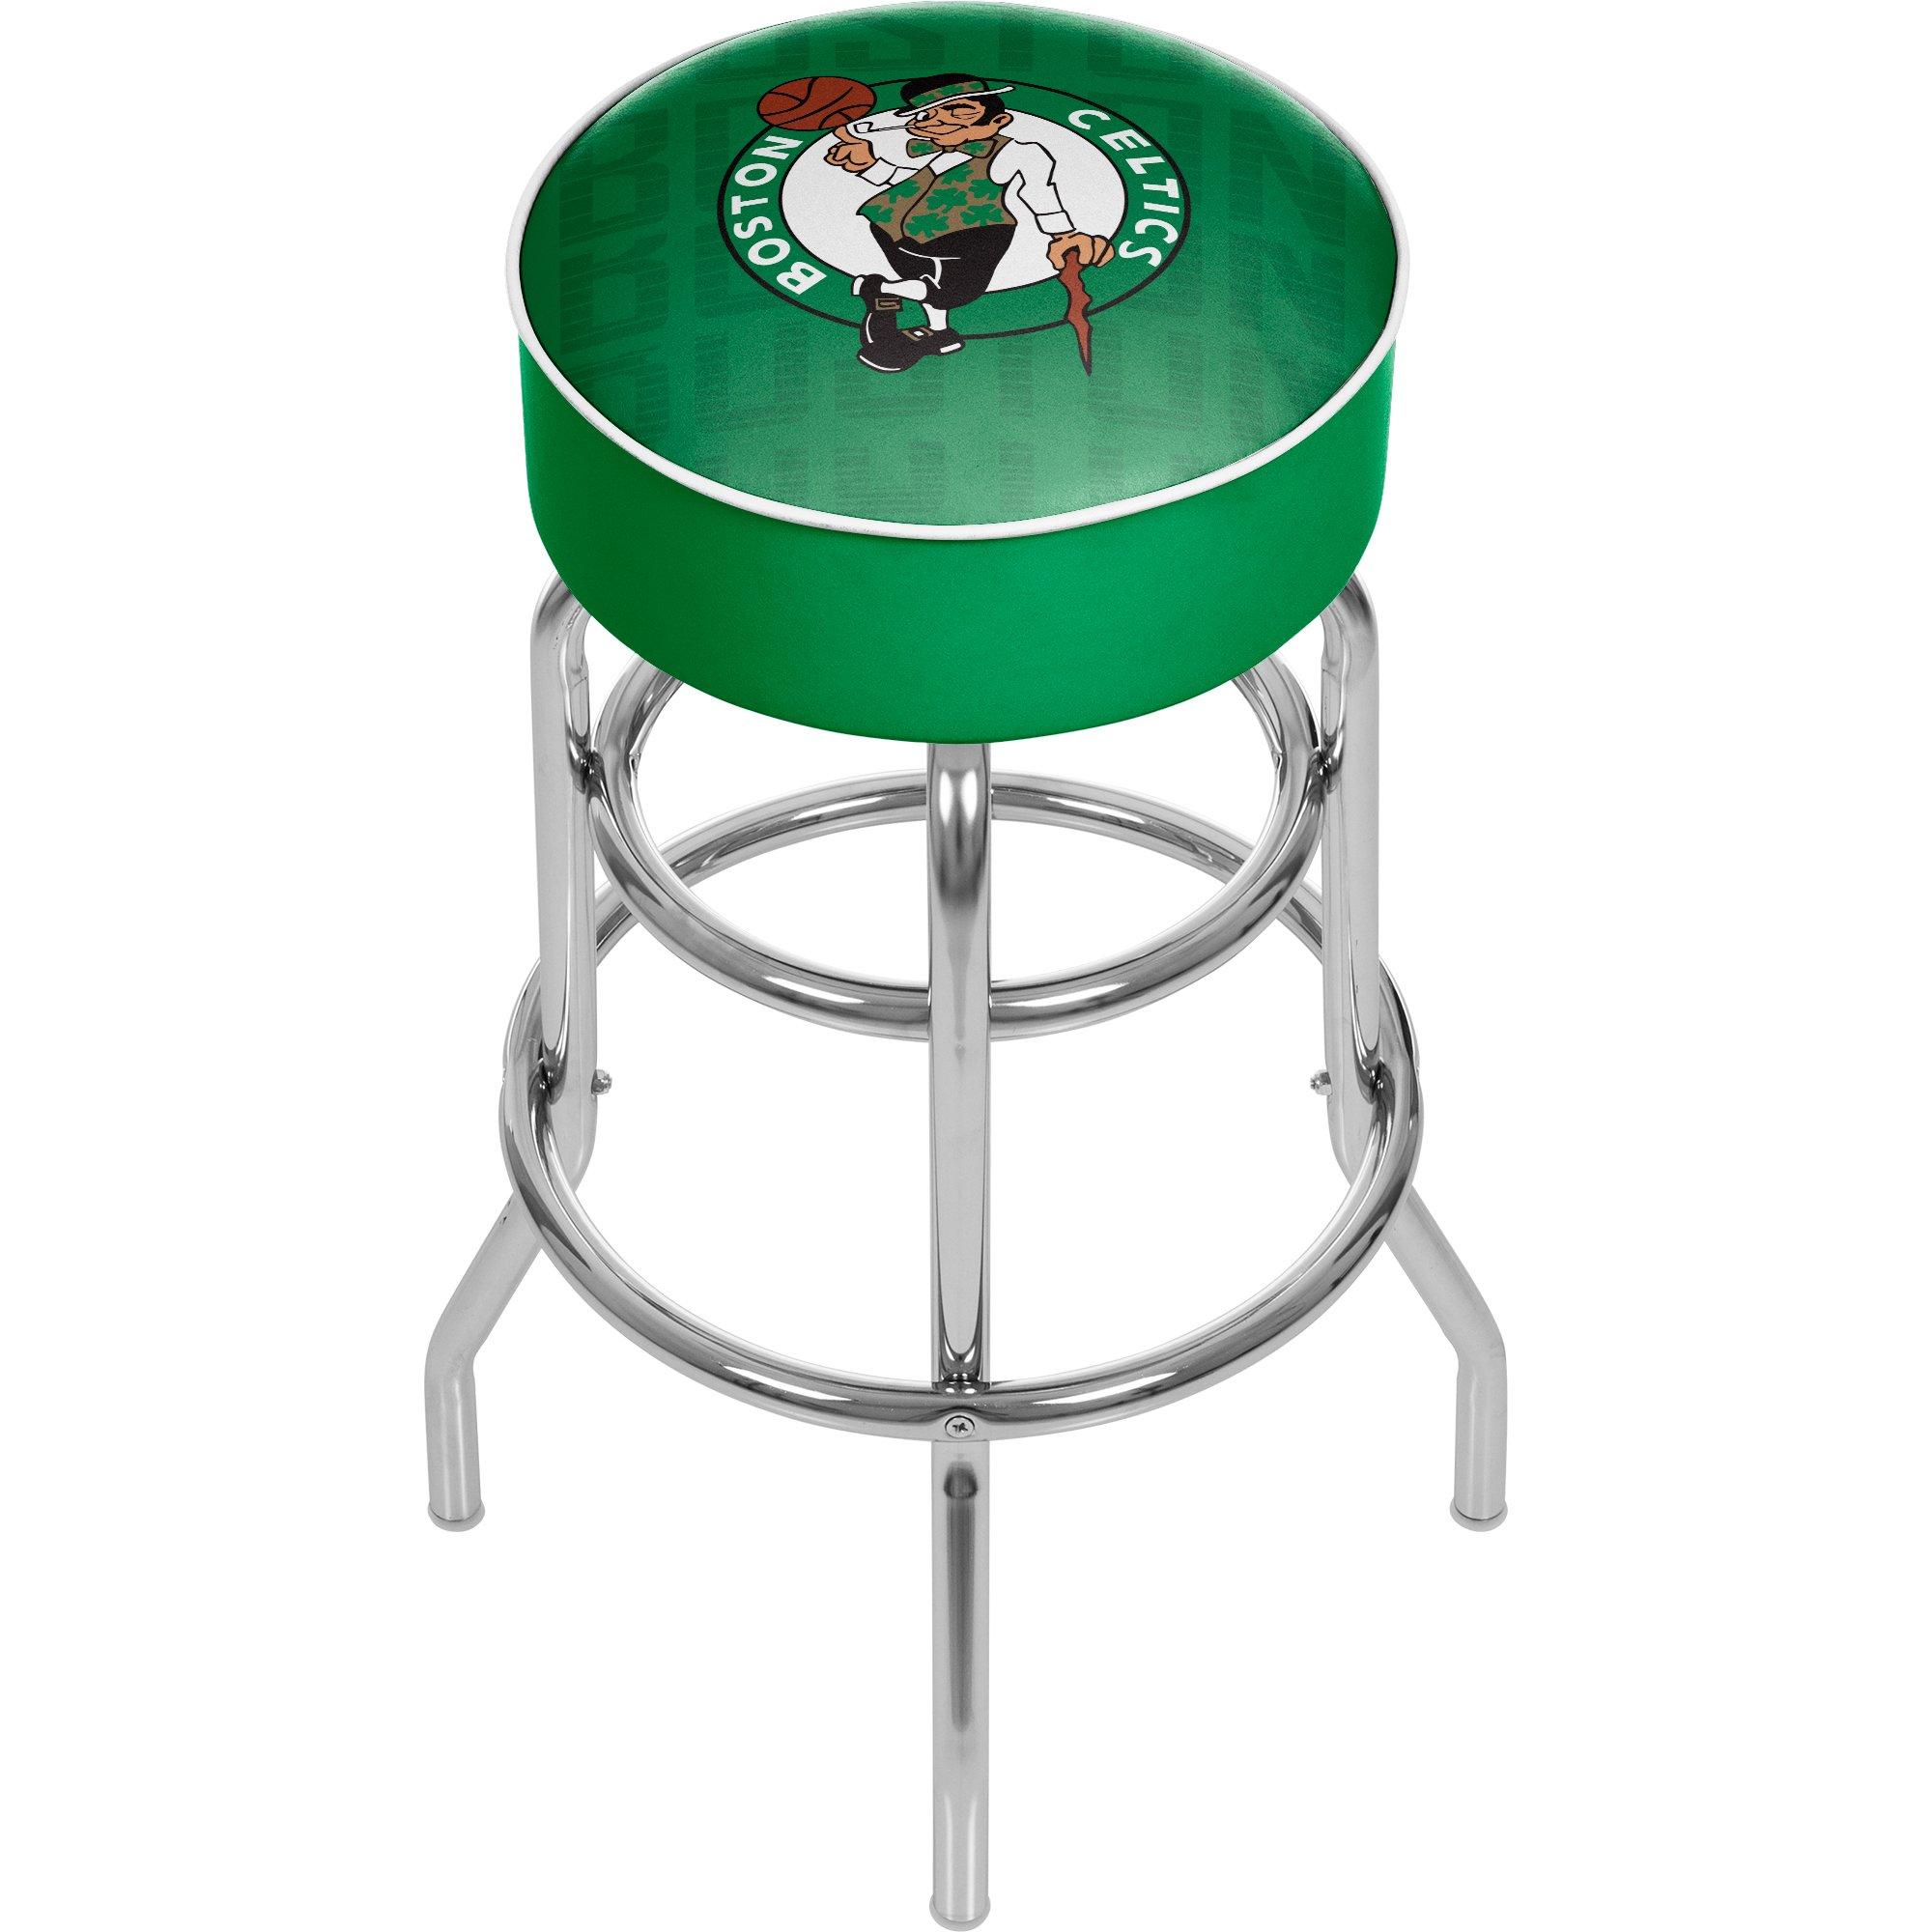 Trademark Gameroom NBA1000-BC3 NBA Padded Swivel Bar Stool - City - Boston Celtics